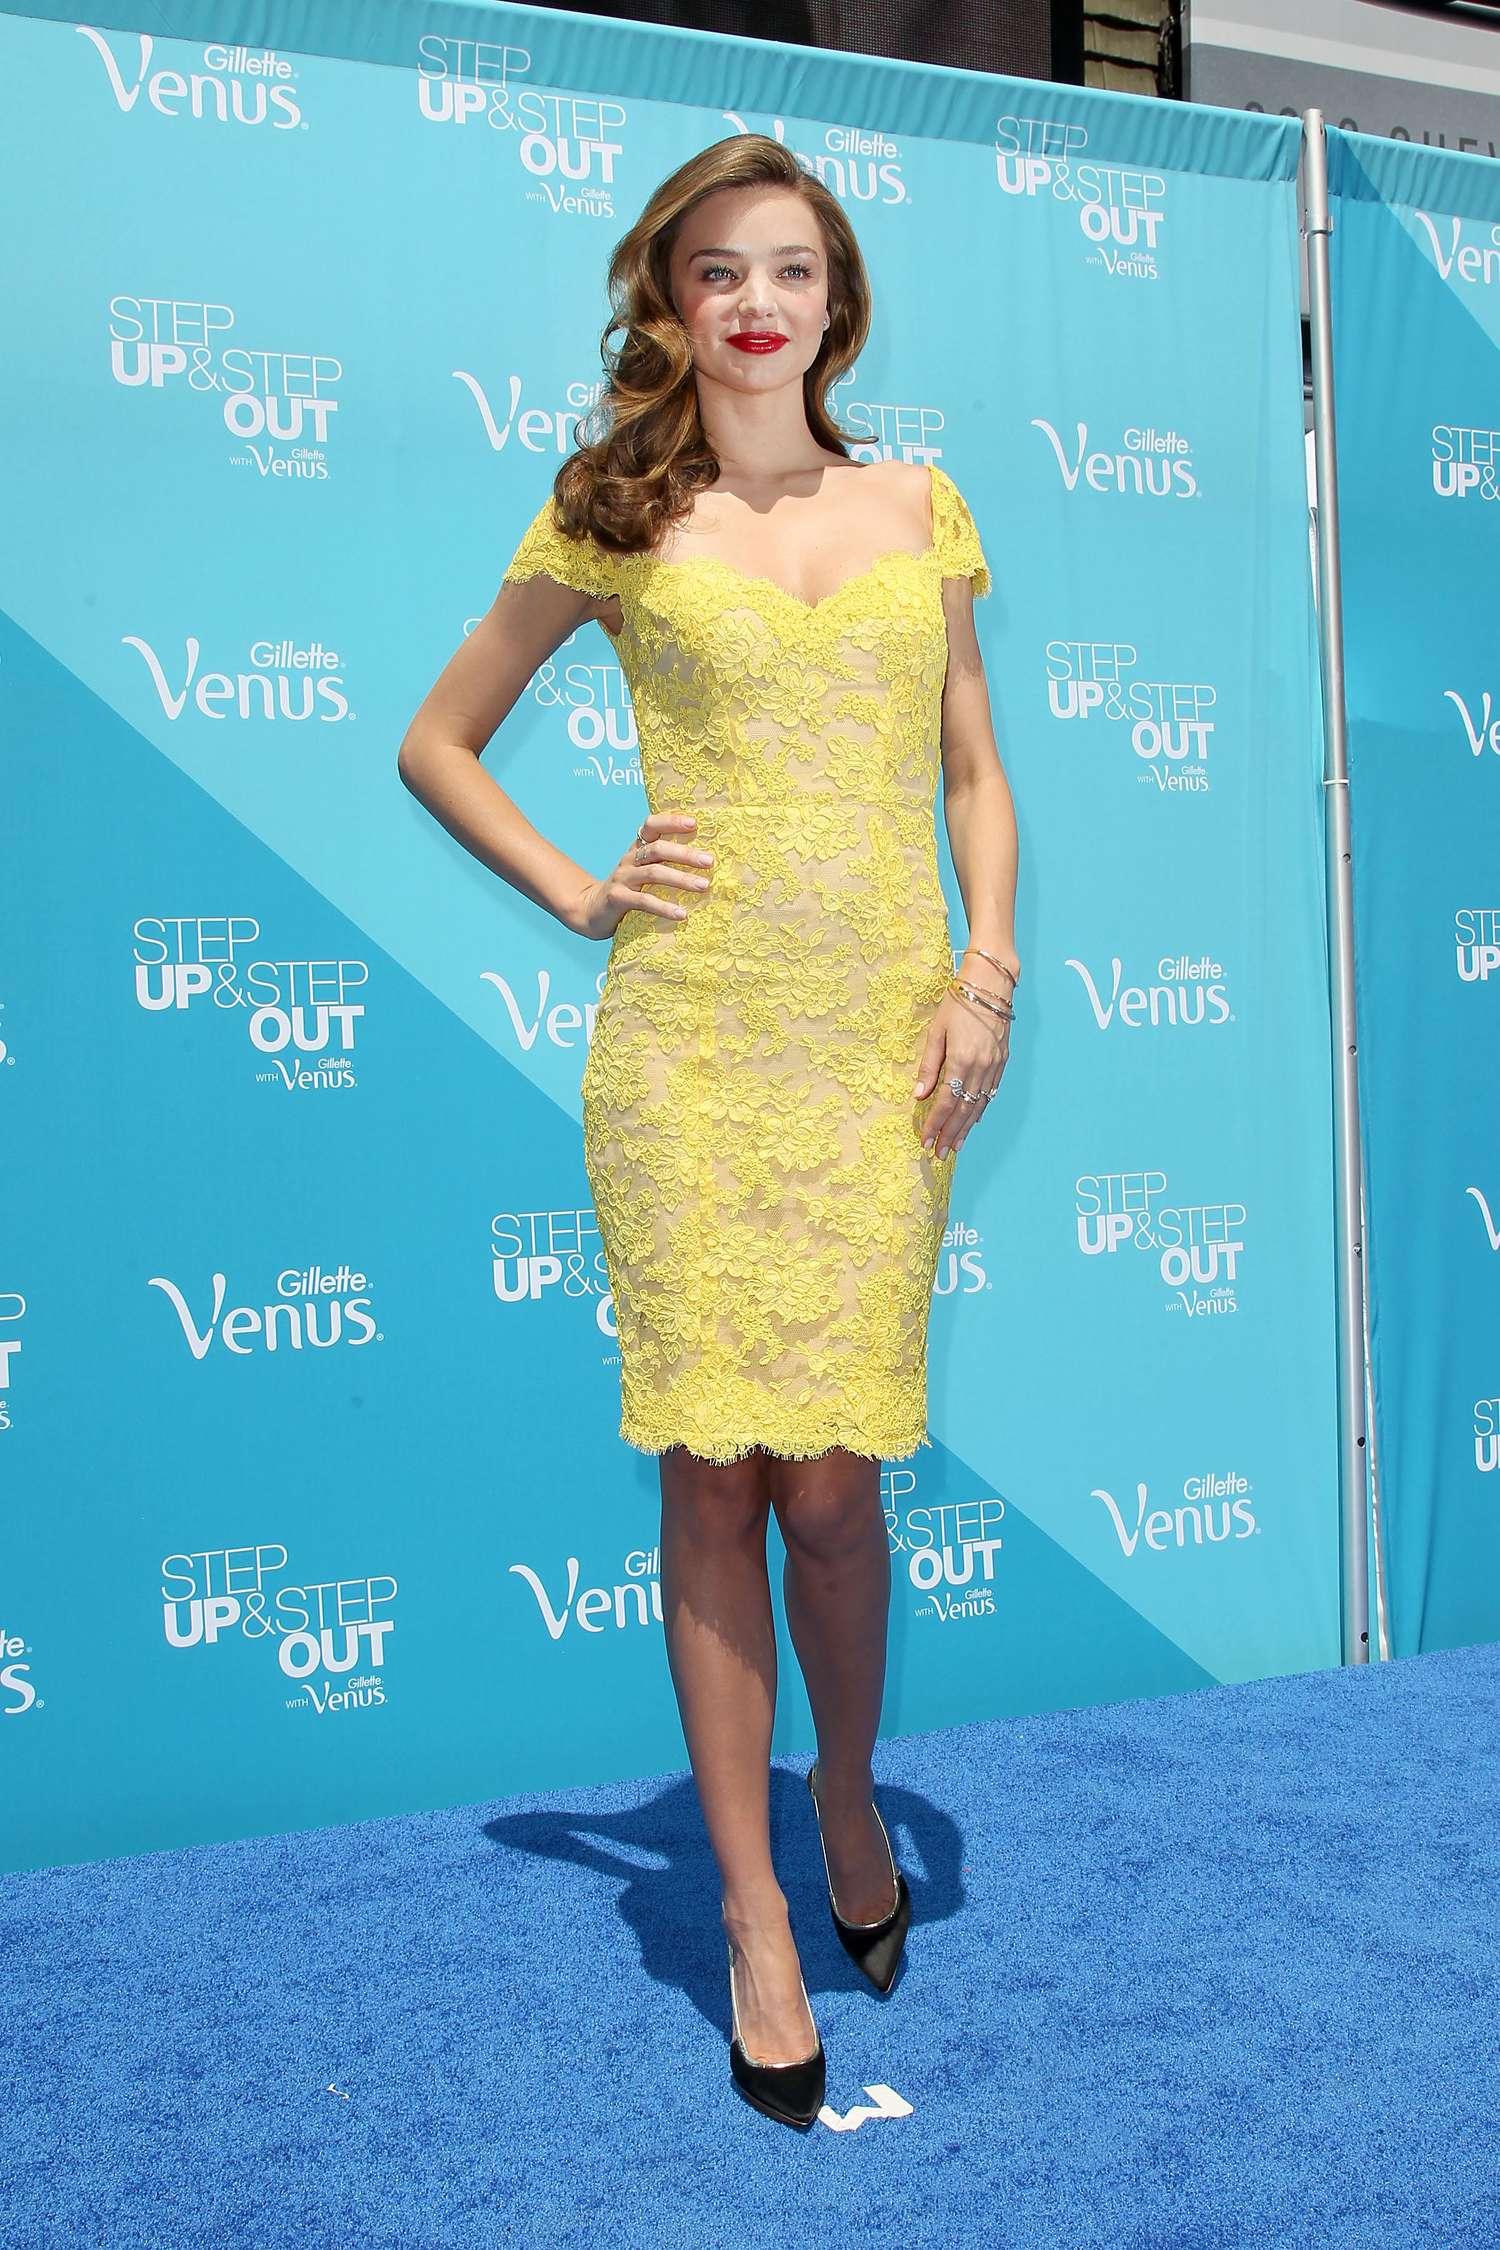 Miranda Kerr porte une robe de soirée jaune de Reem Acra.